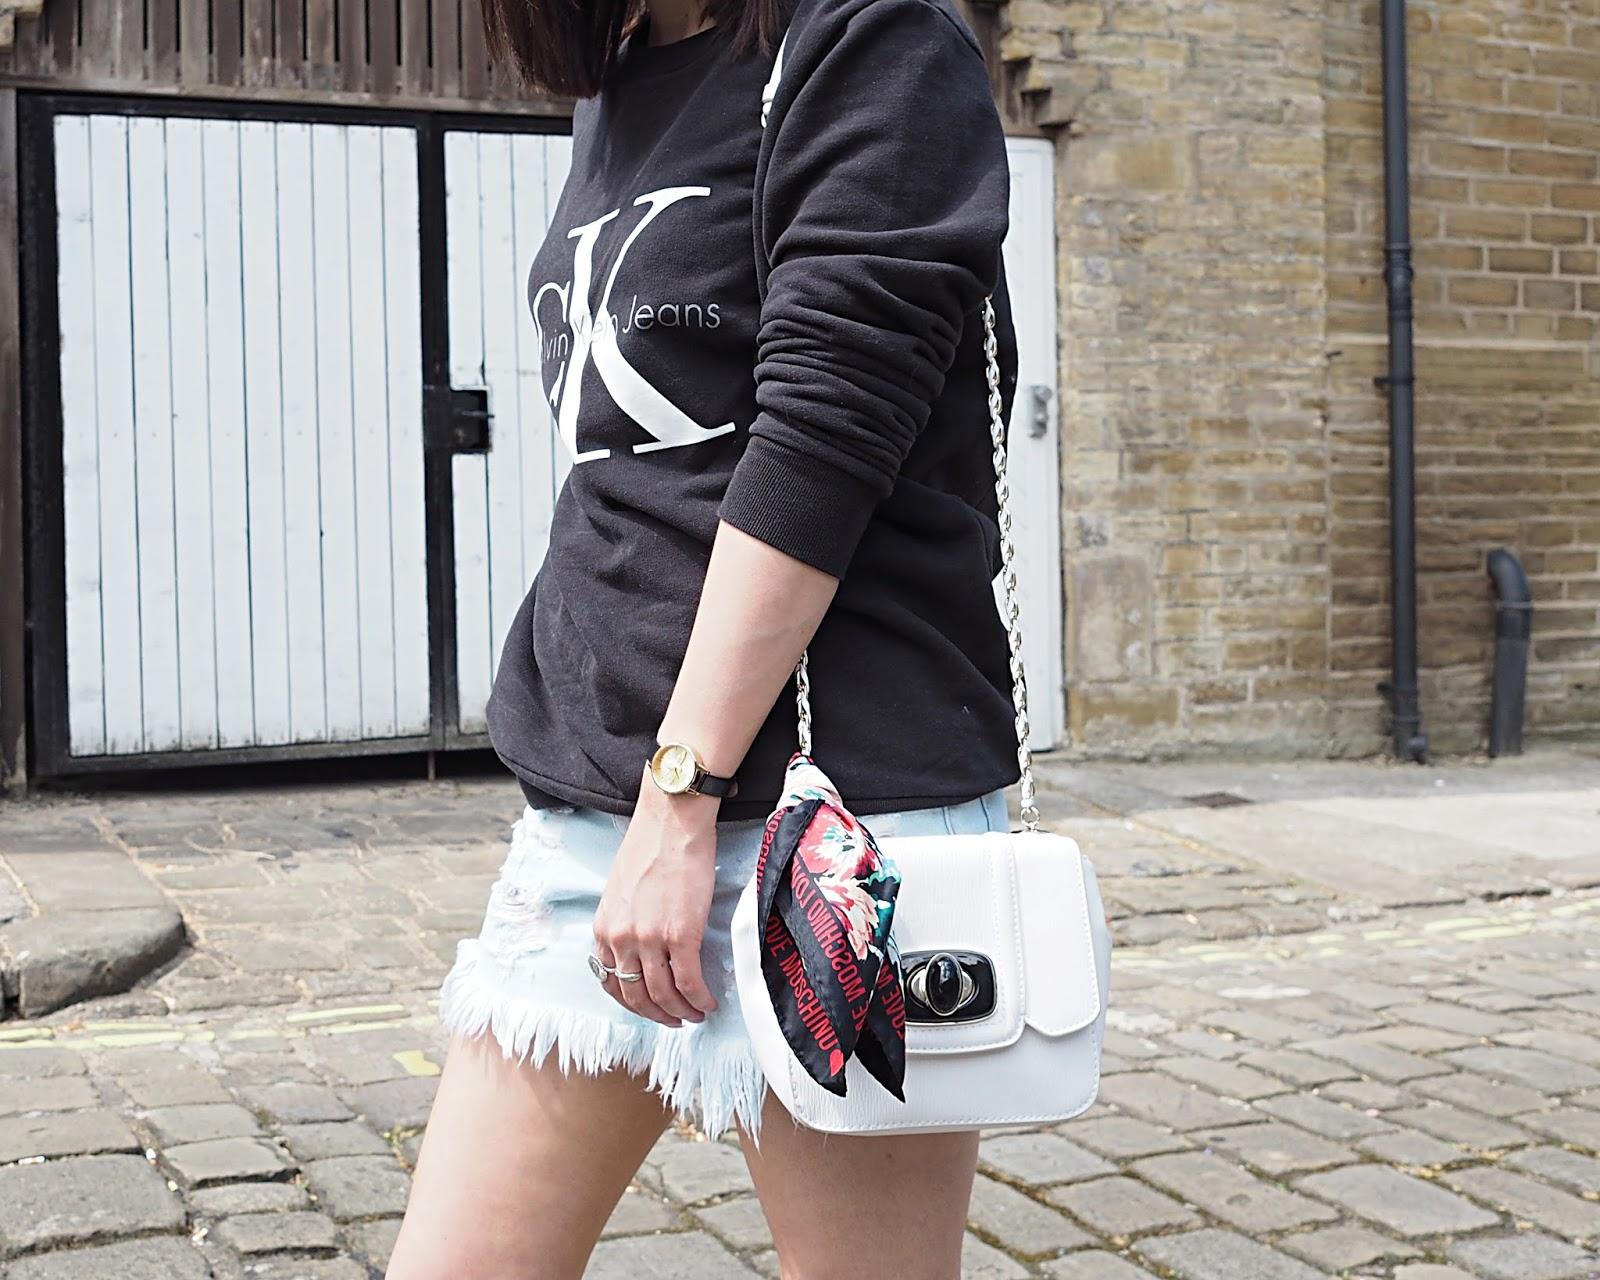 Calvin Klein Summer Outfit 5